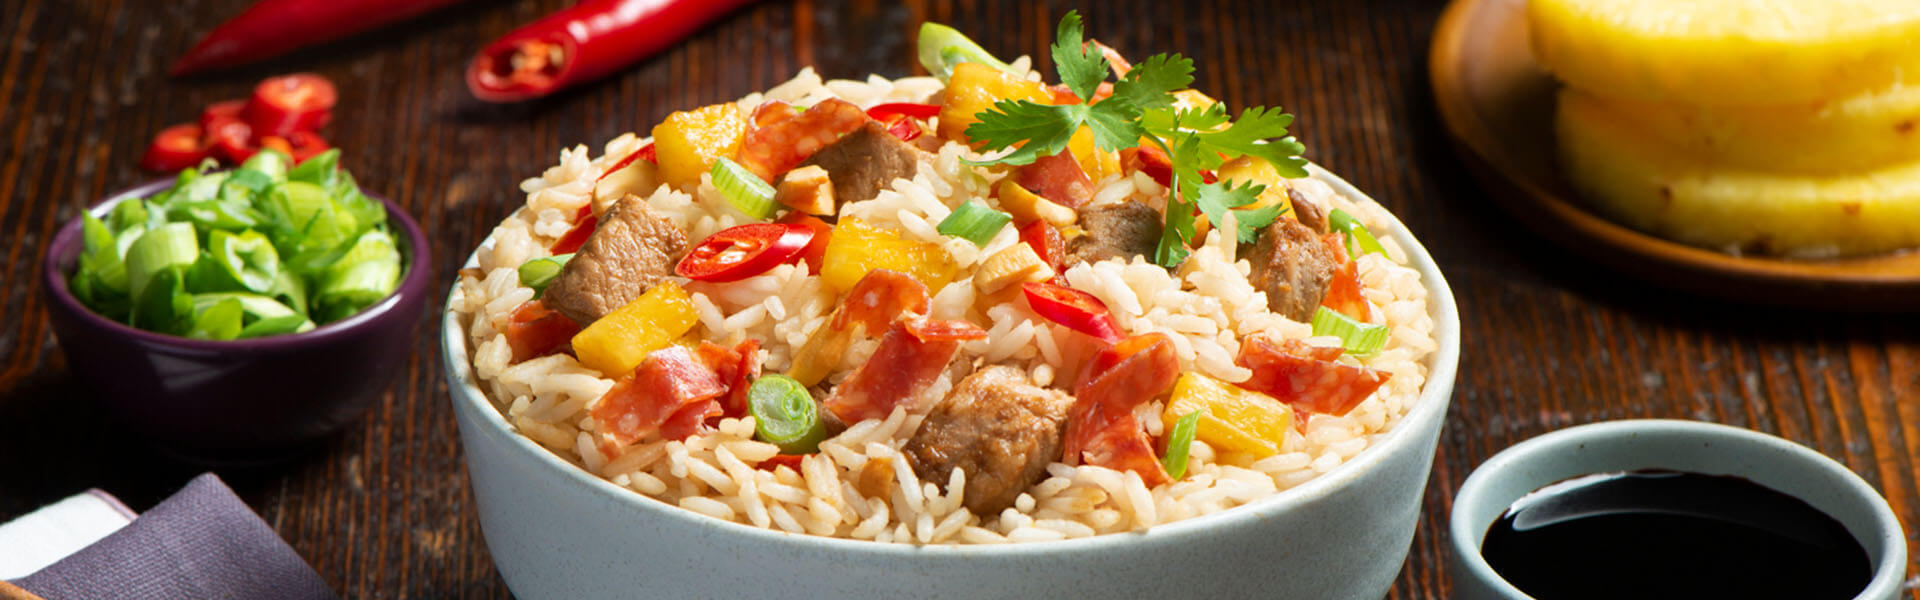 Pineapple, Pork and Salami Fried Rice